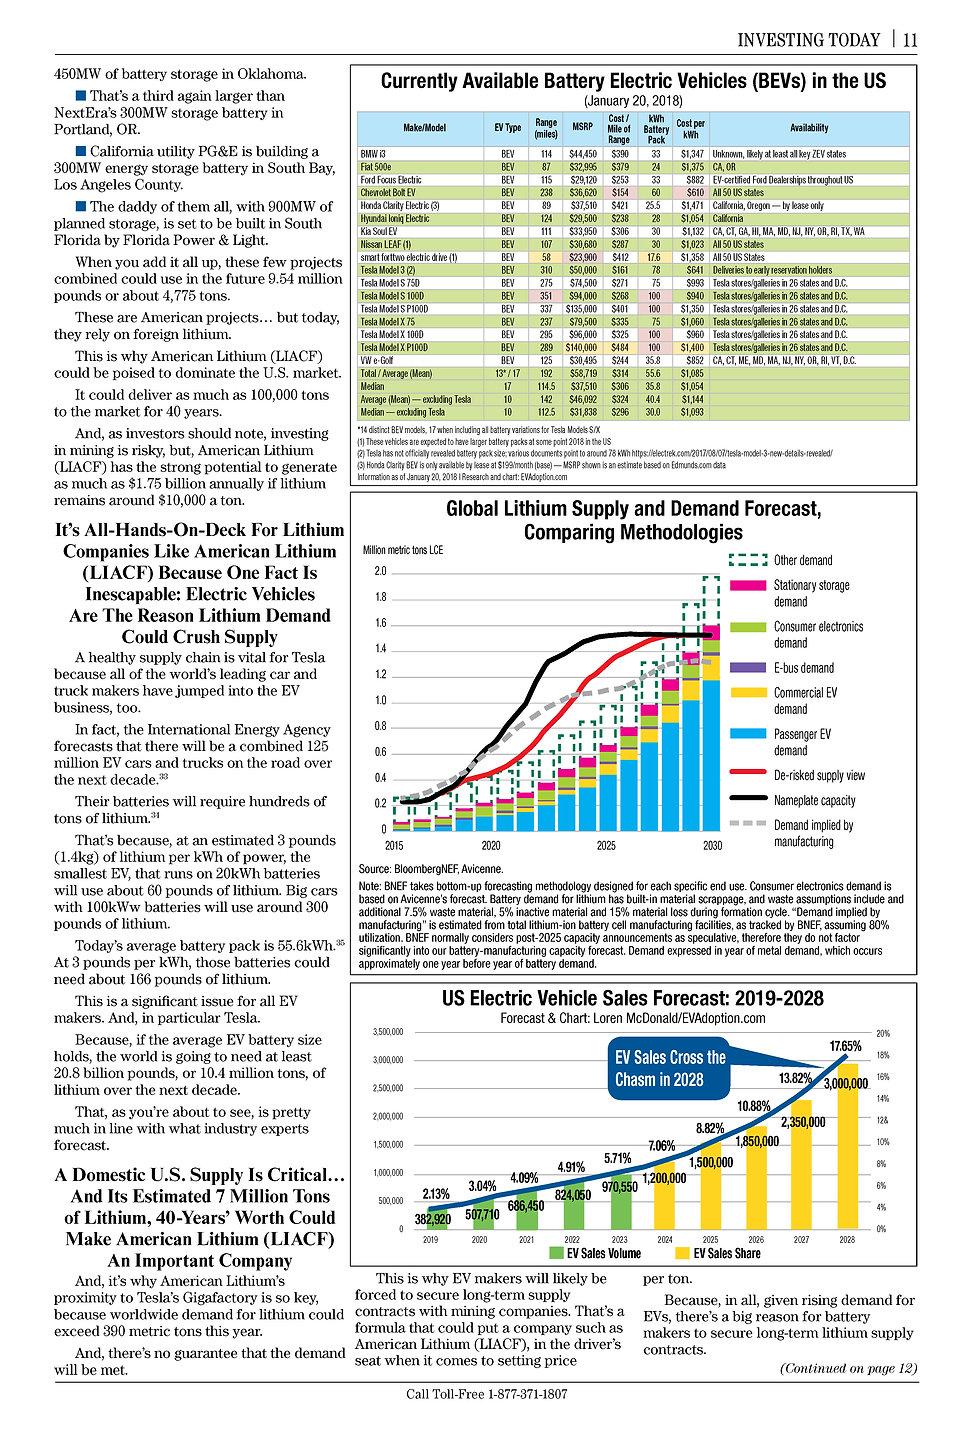 LIACF Newsalog_Page_11.jpg